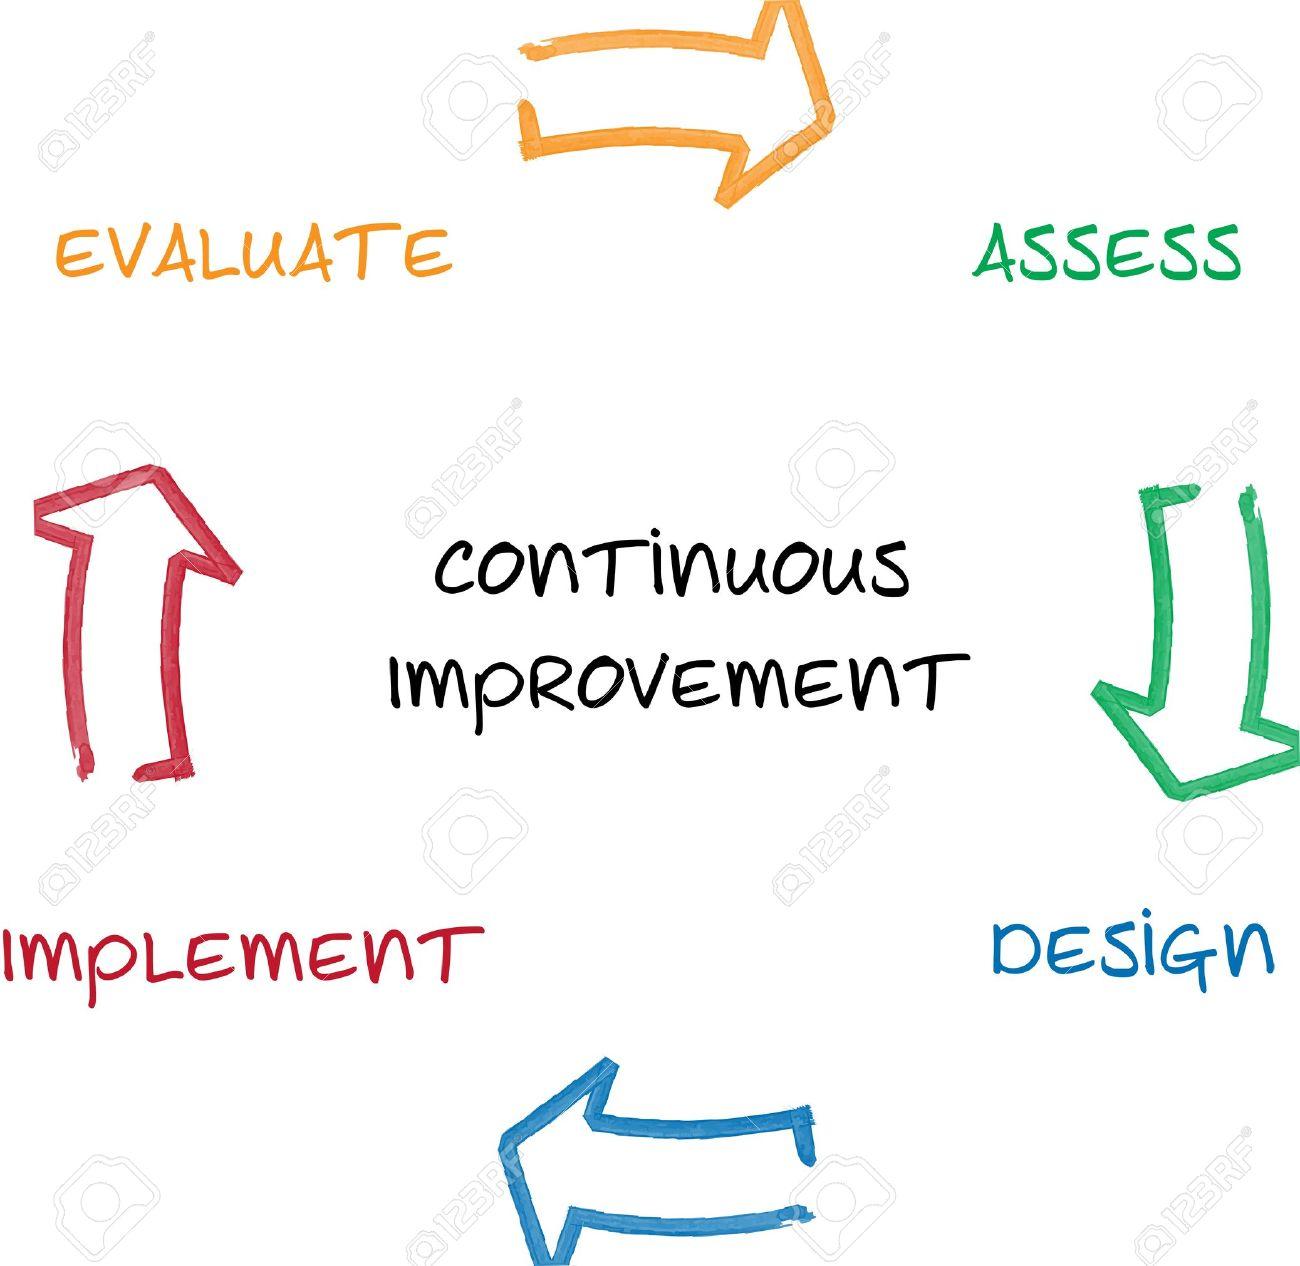 continuous improvement management business diagram whiteboard    illustration   continuous improvement management business diagram whiteboard chart illustration